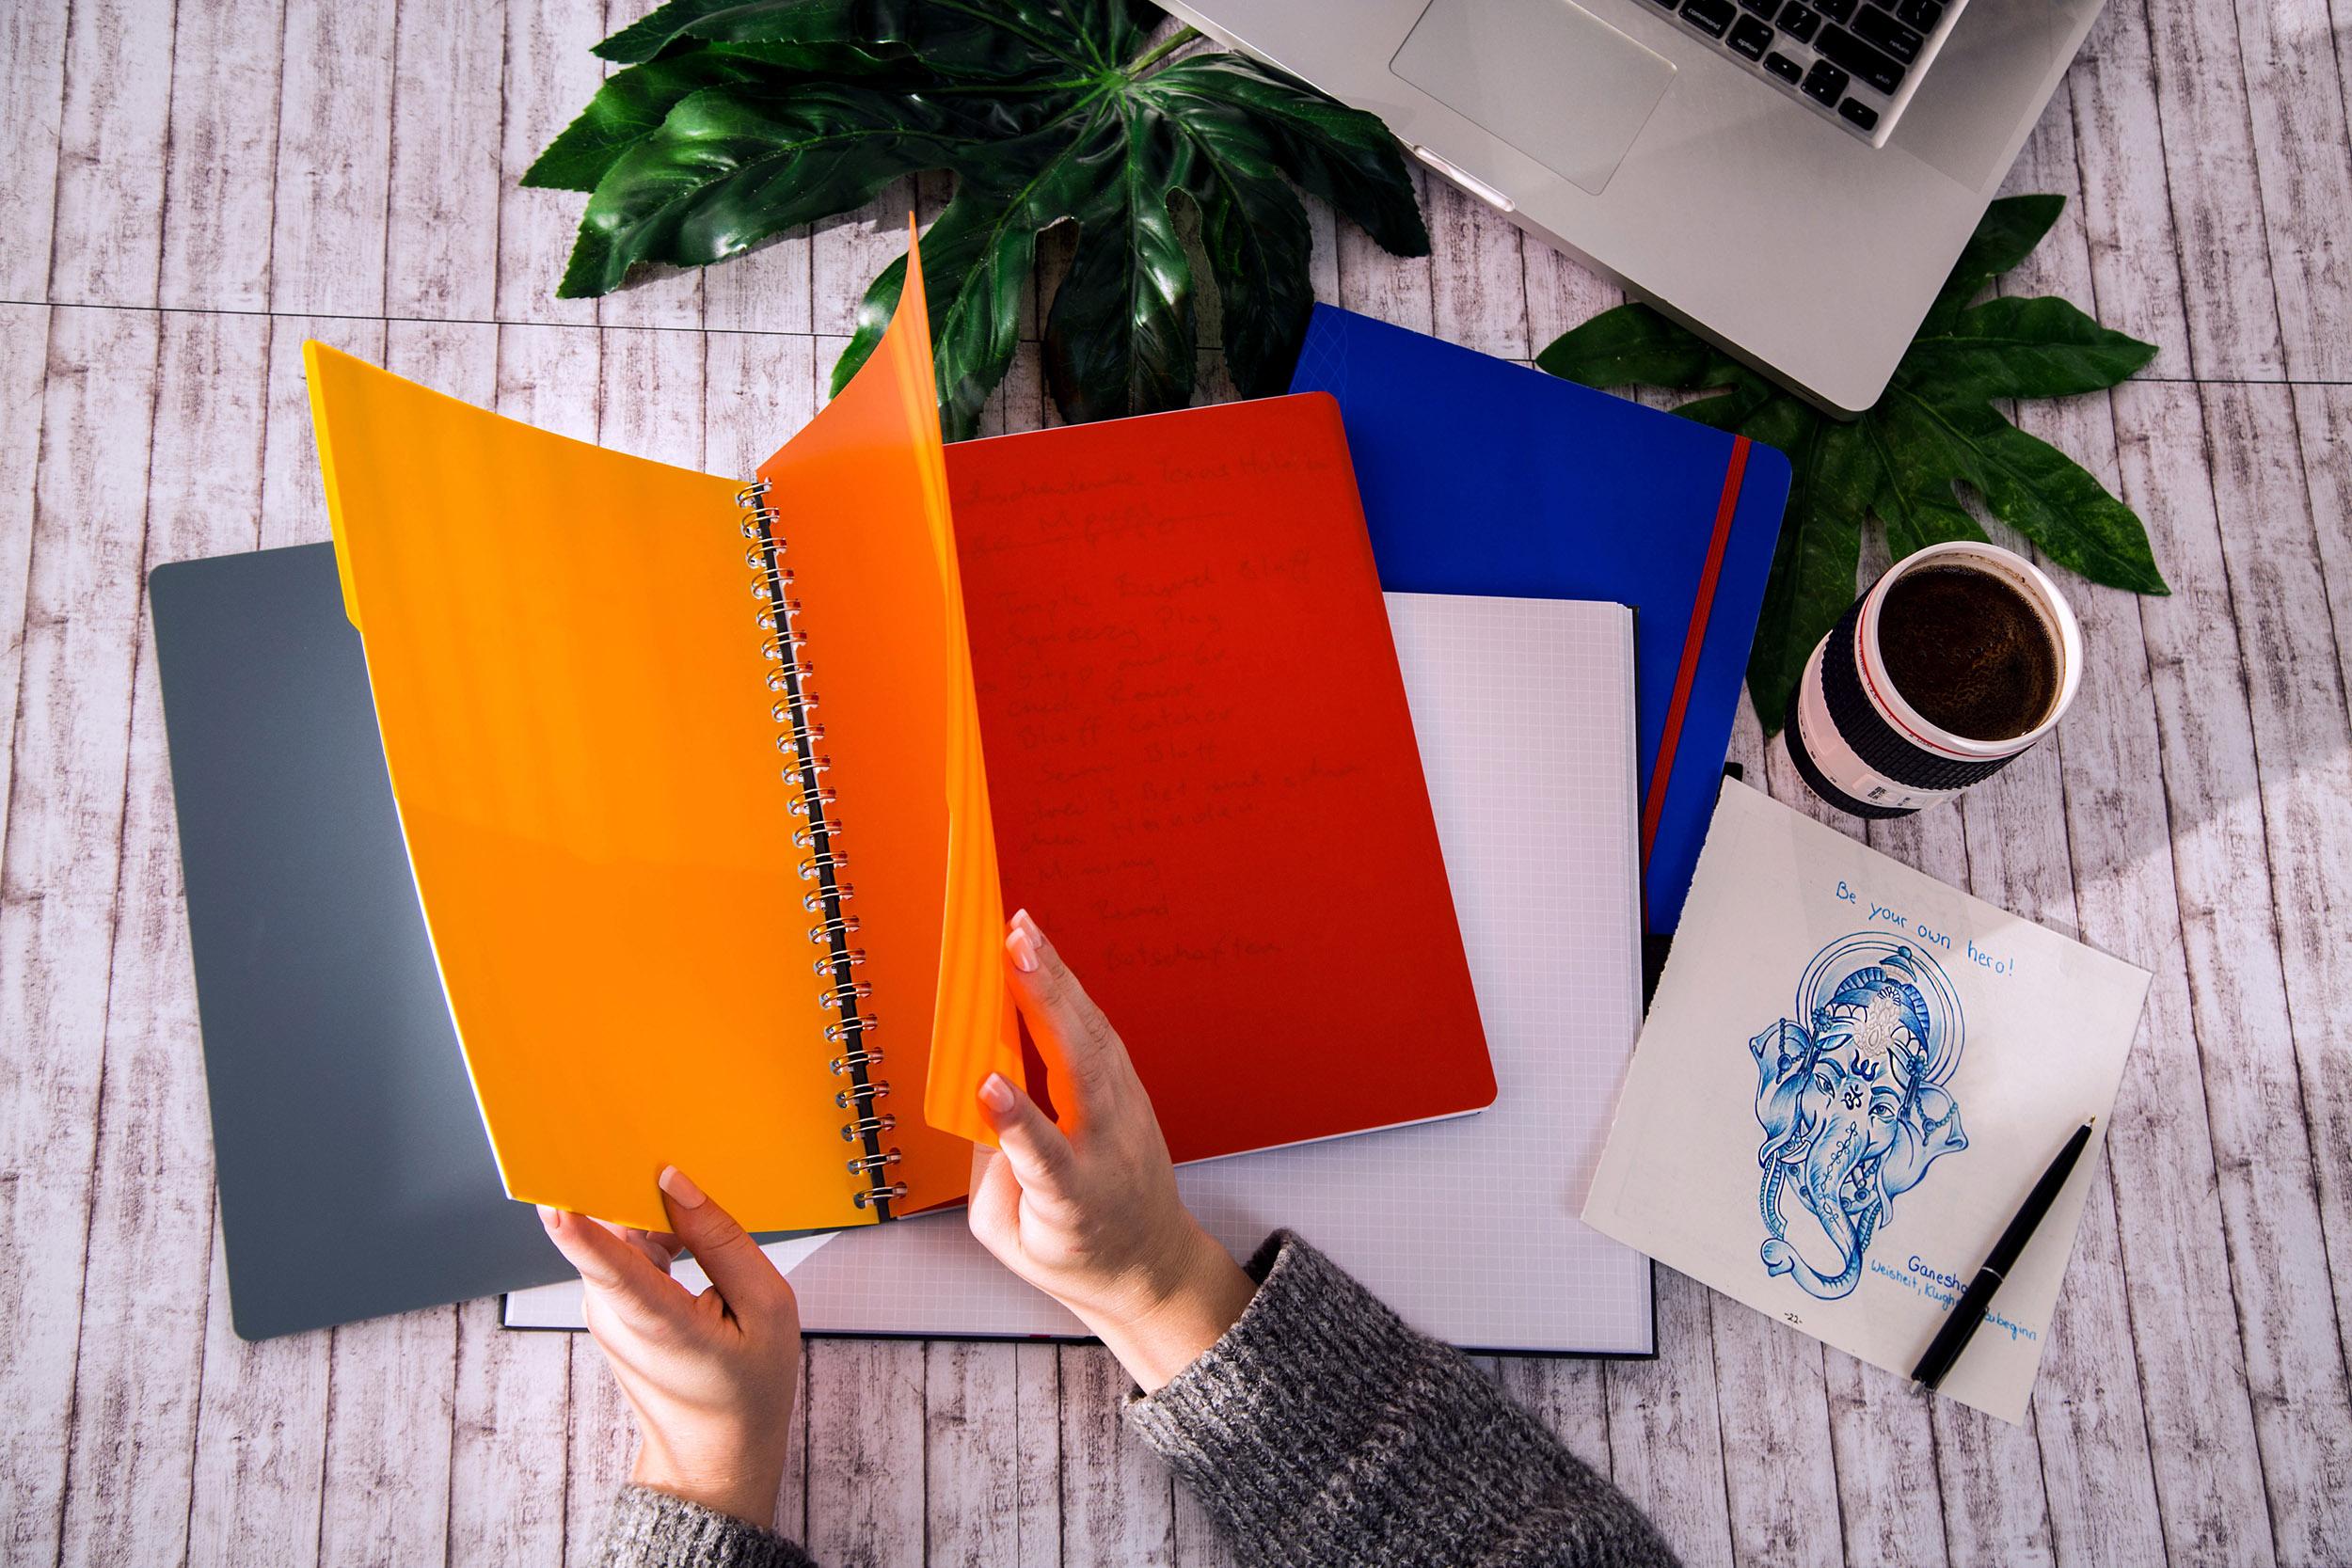 Amely Rose fashionblogger Notizio Avery Zweckform Bulletjournal deutsch kaufen Bujo Planer Kalender 2018